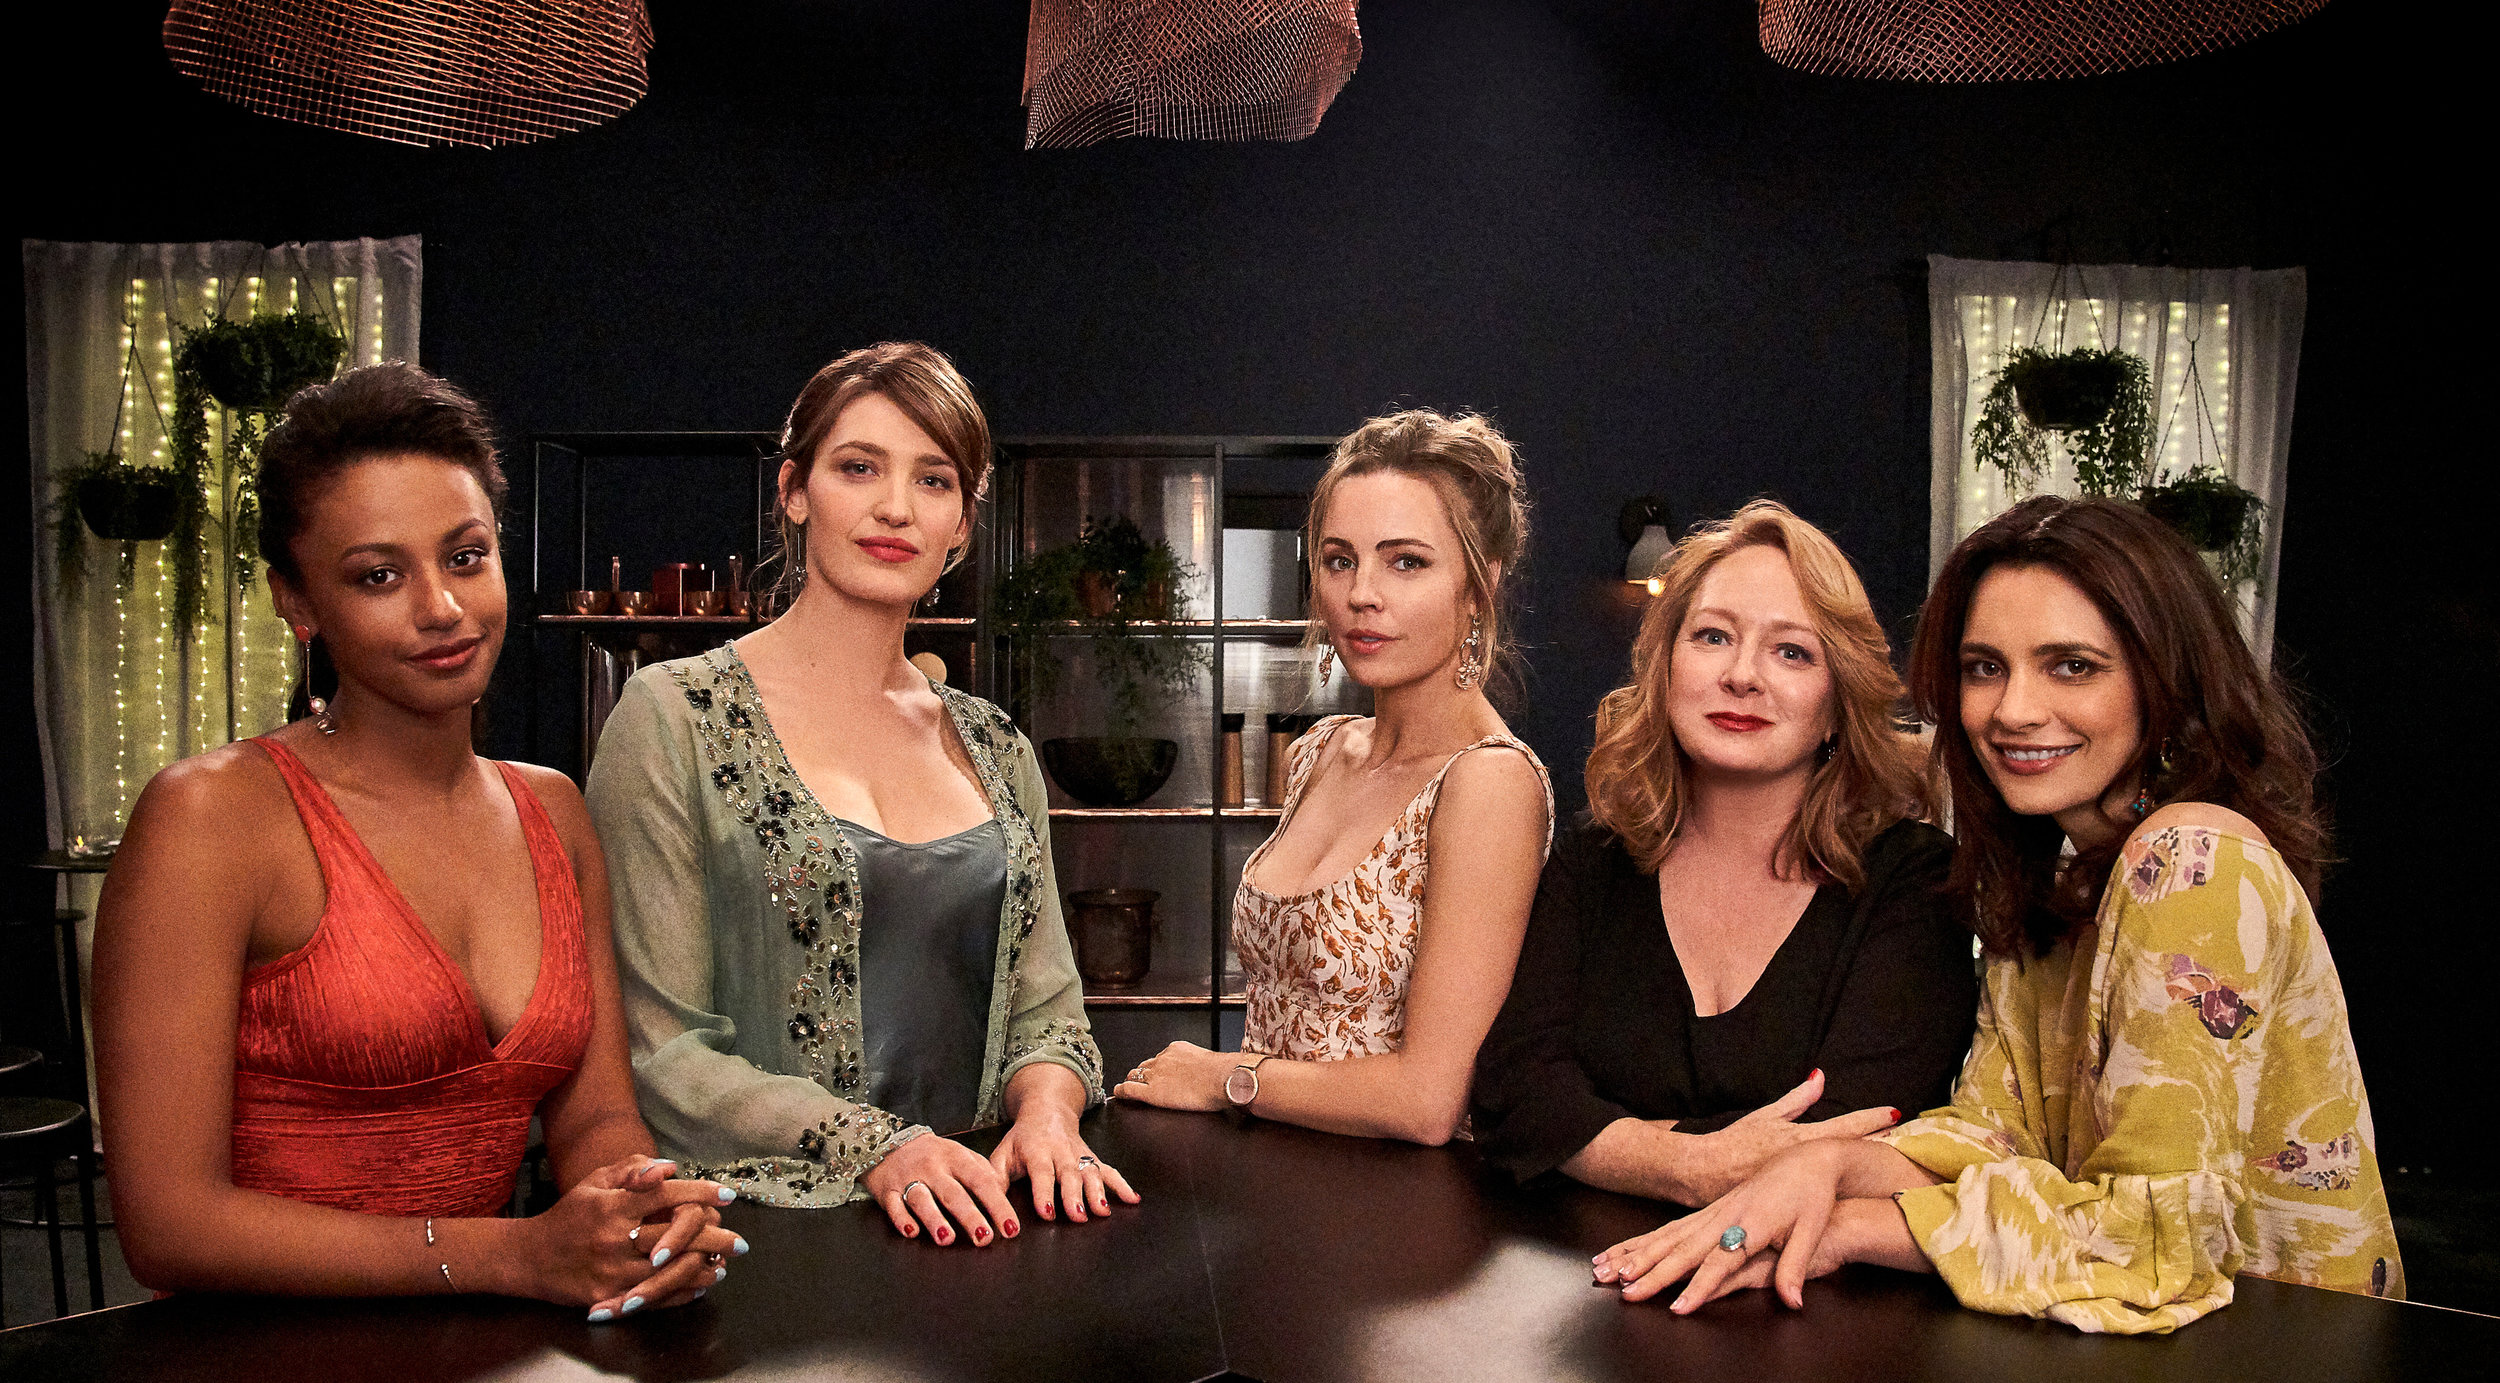 The cast of BAD MOTHERS - Shalom Brune-Franklin, Tess Haubrich, Melissa George, Mandy McElhinney & Jess Tovey  Image - Nine